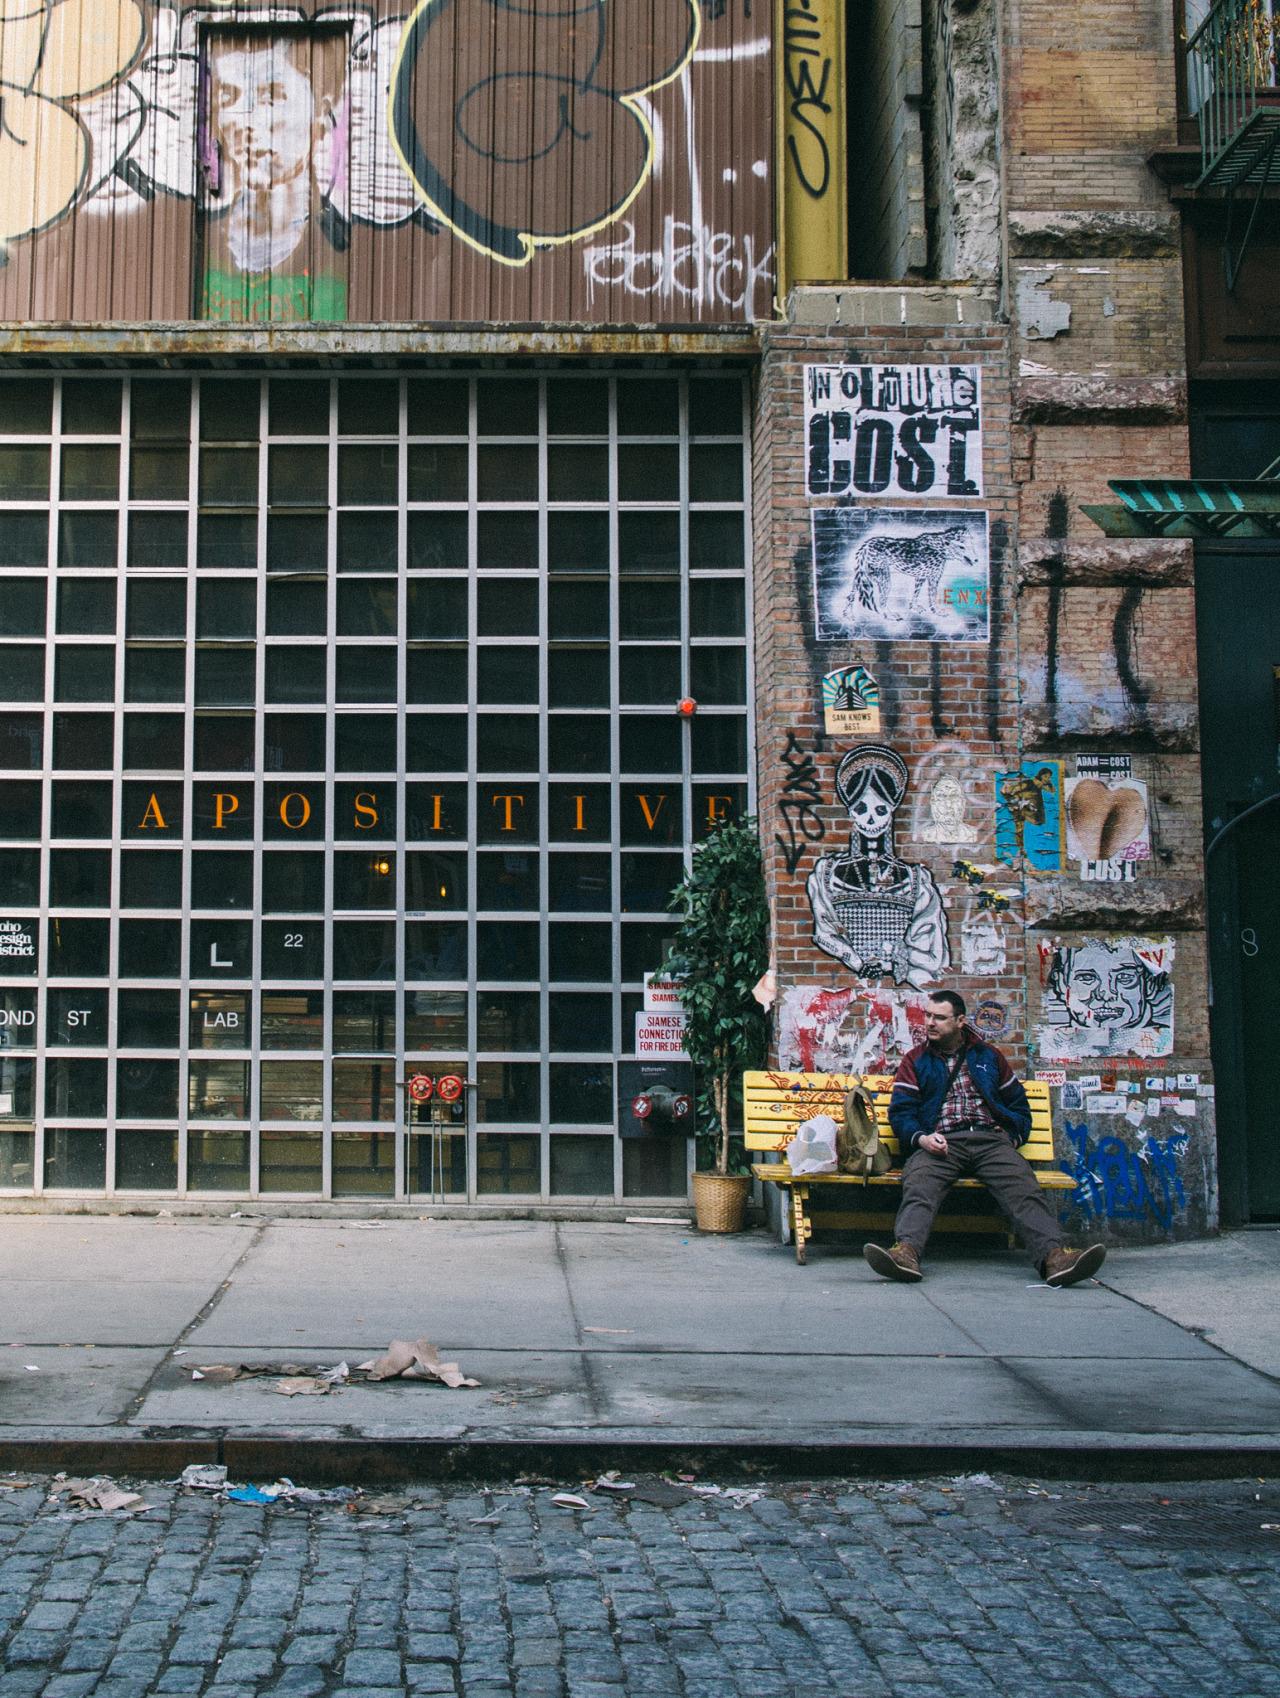 73. A Positive    www.willoharephotography.com